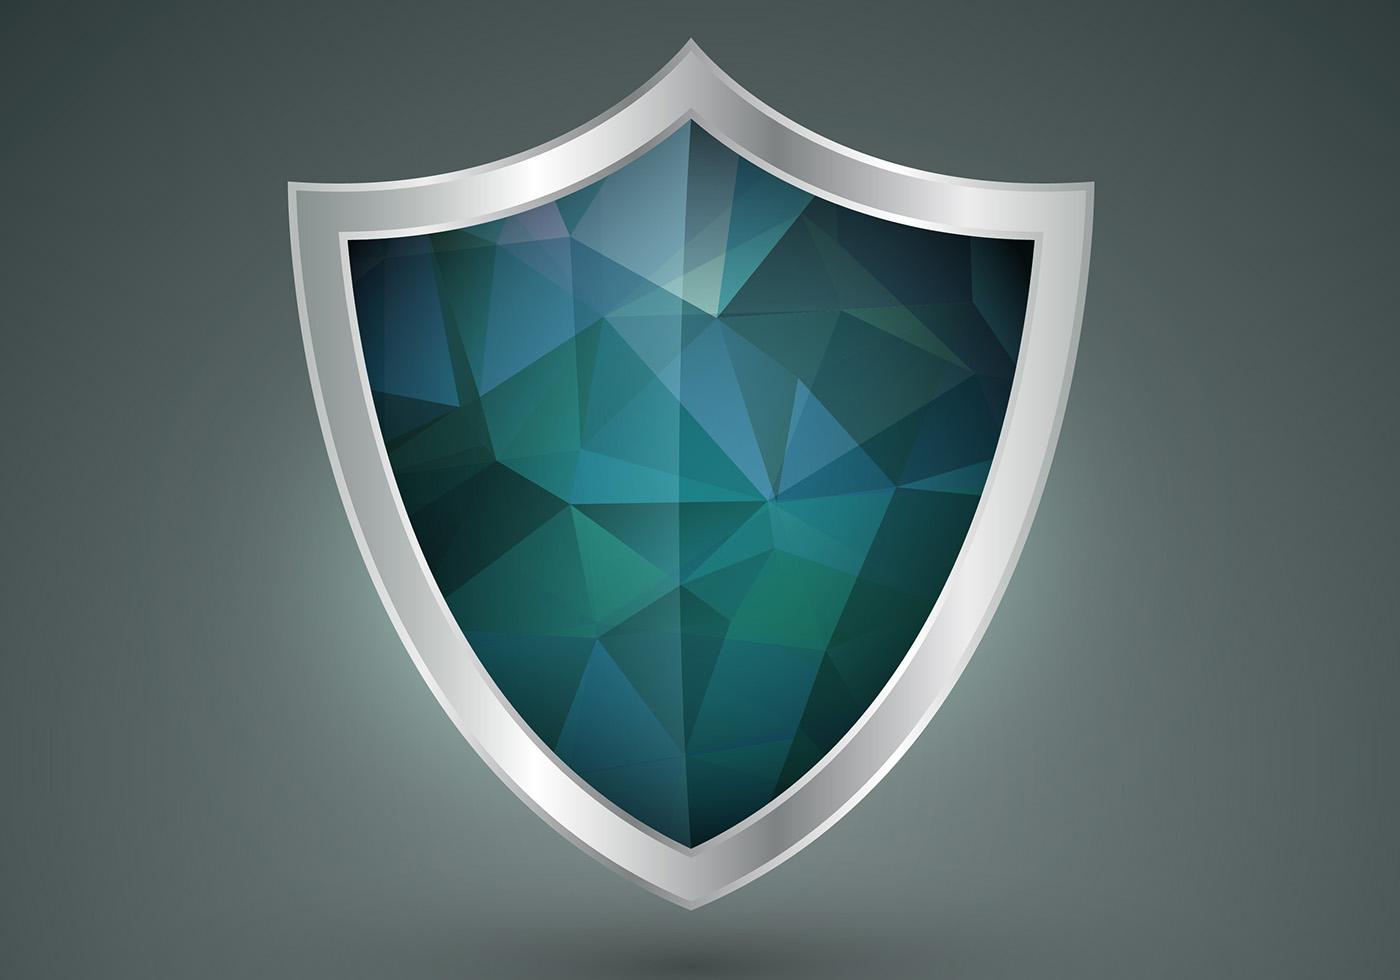 Polygonal Shield Shape Vector - Download Free Vector Art ...